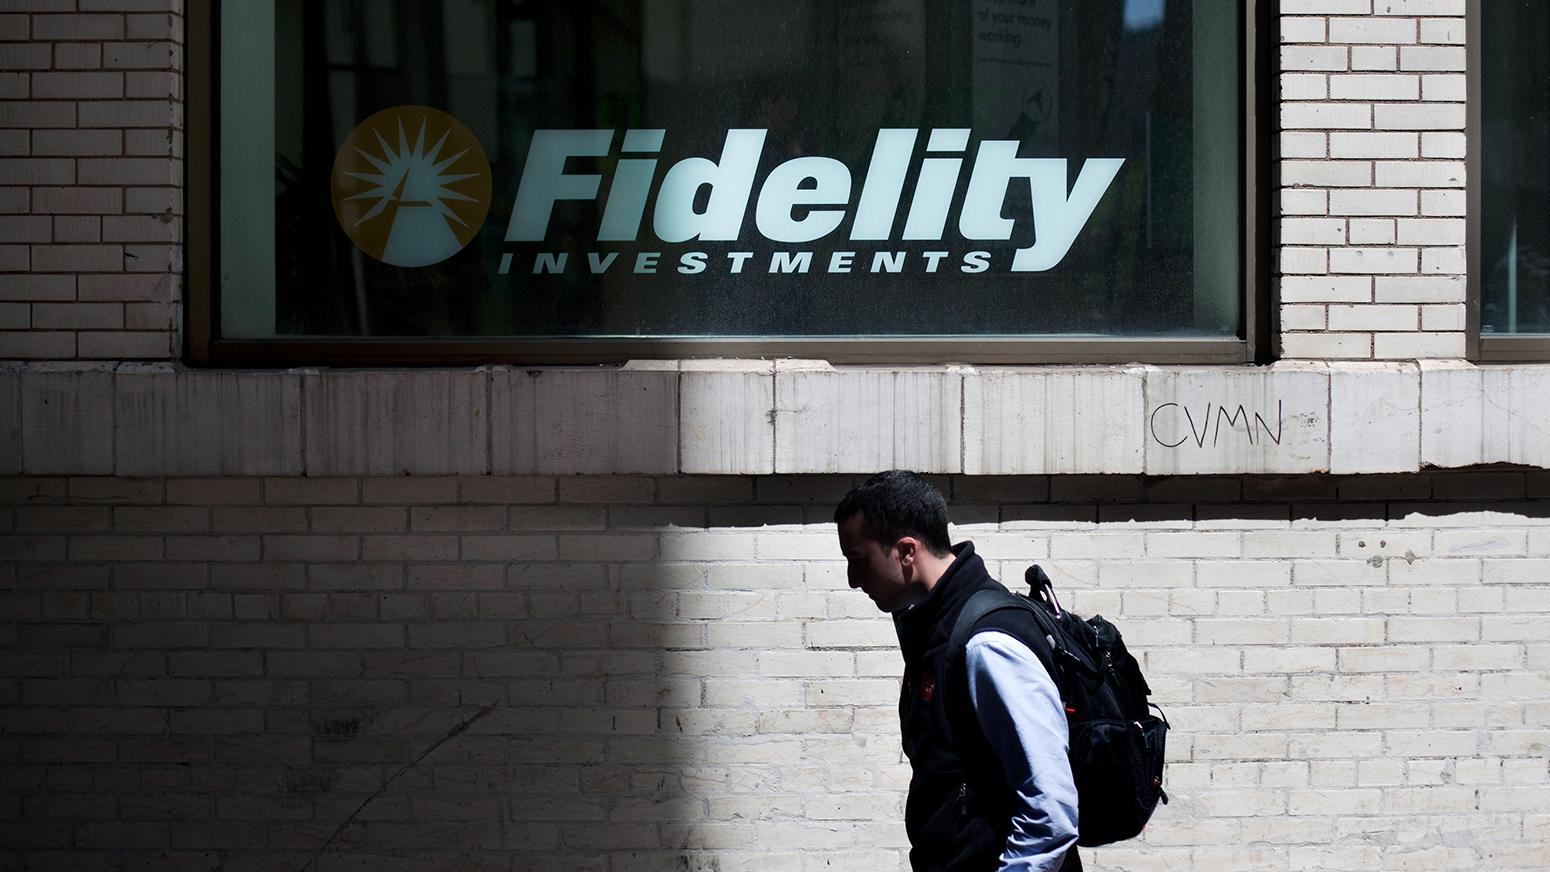 Fidelity's AUM rises 15% in 2017 to $2 45 trillion